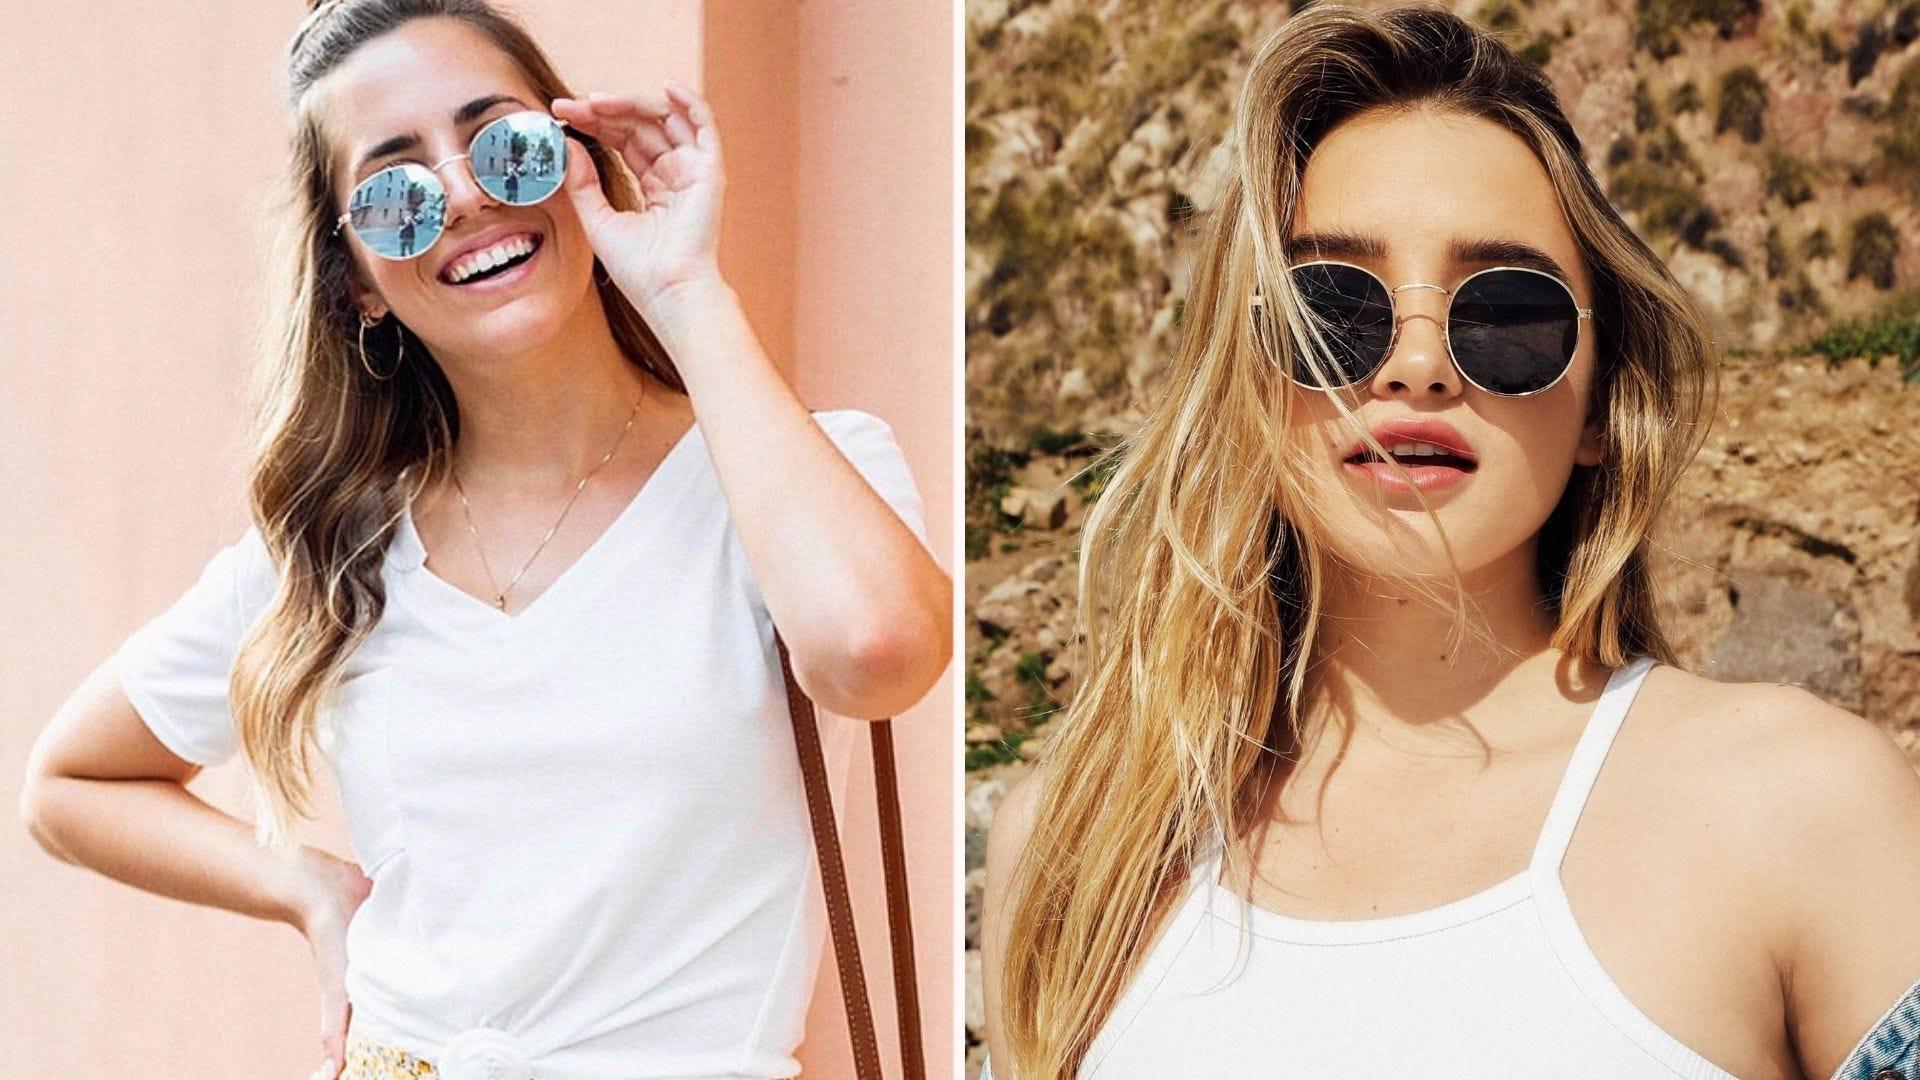 Two women in white shirts wearing round sunglasses